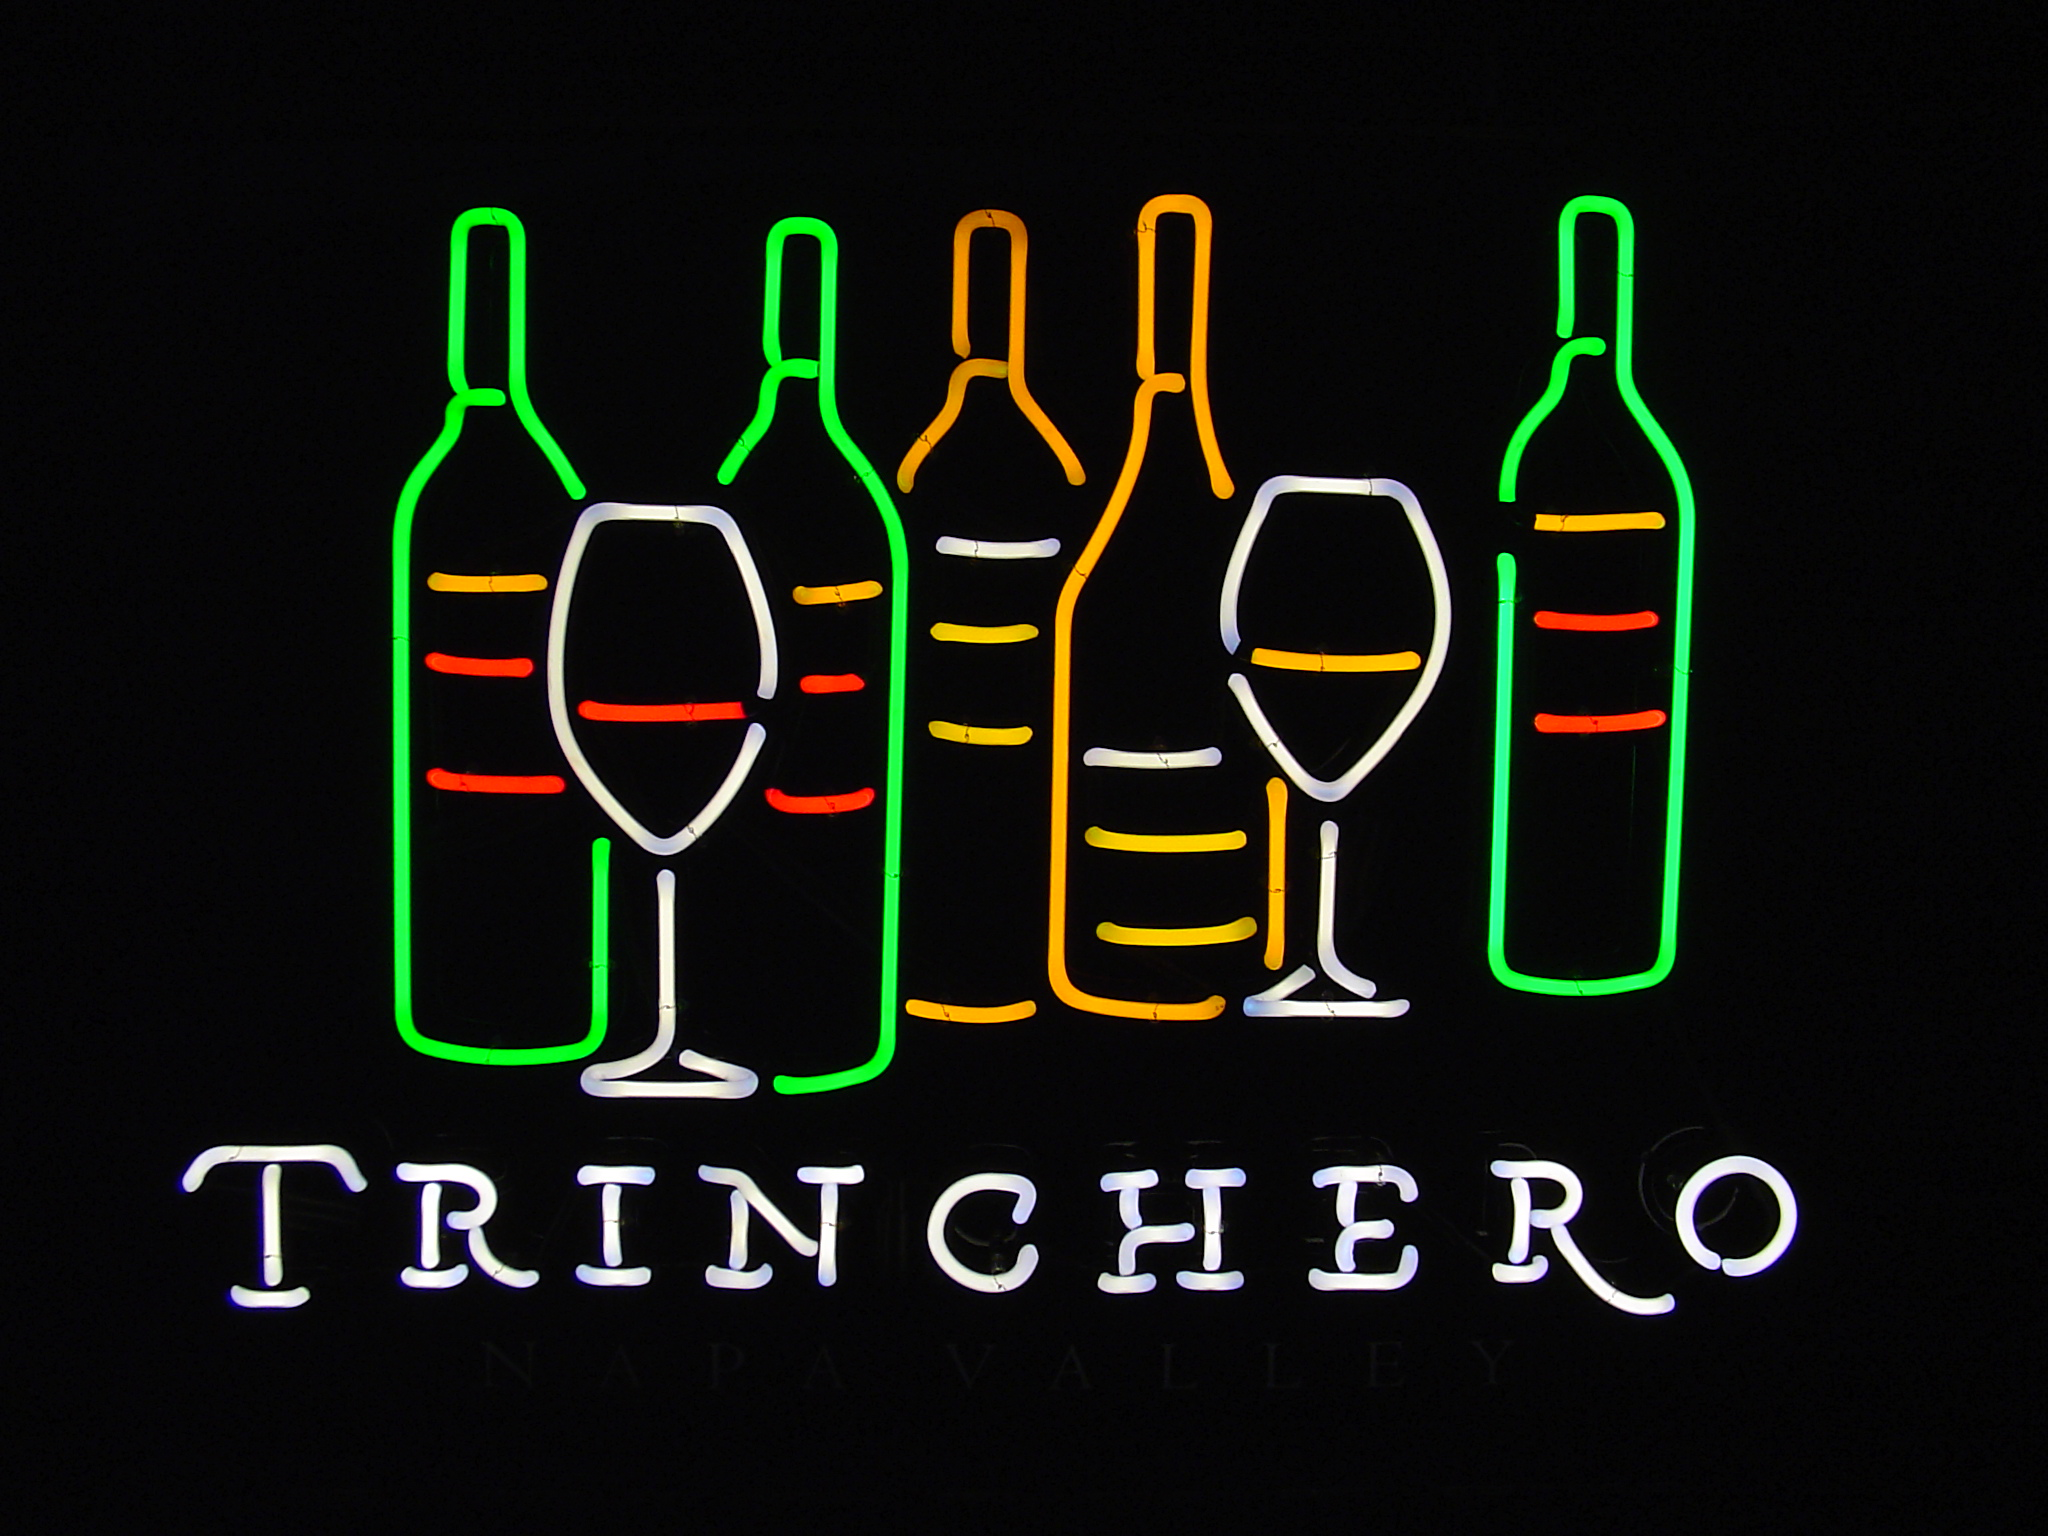 Trinchero Family Vineyards for Manhattan wine shop